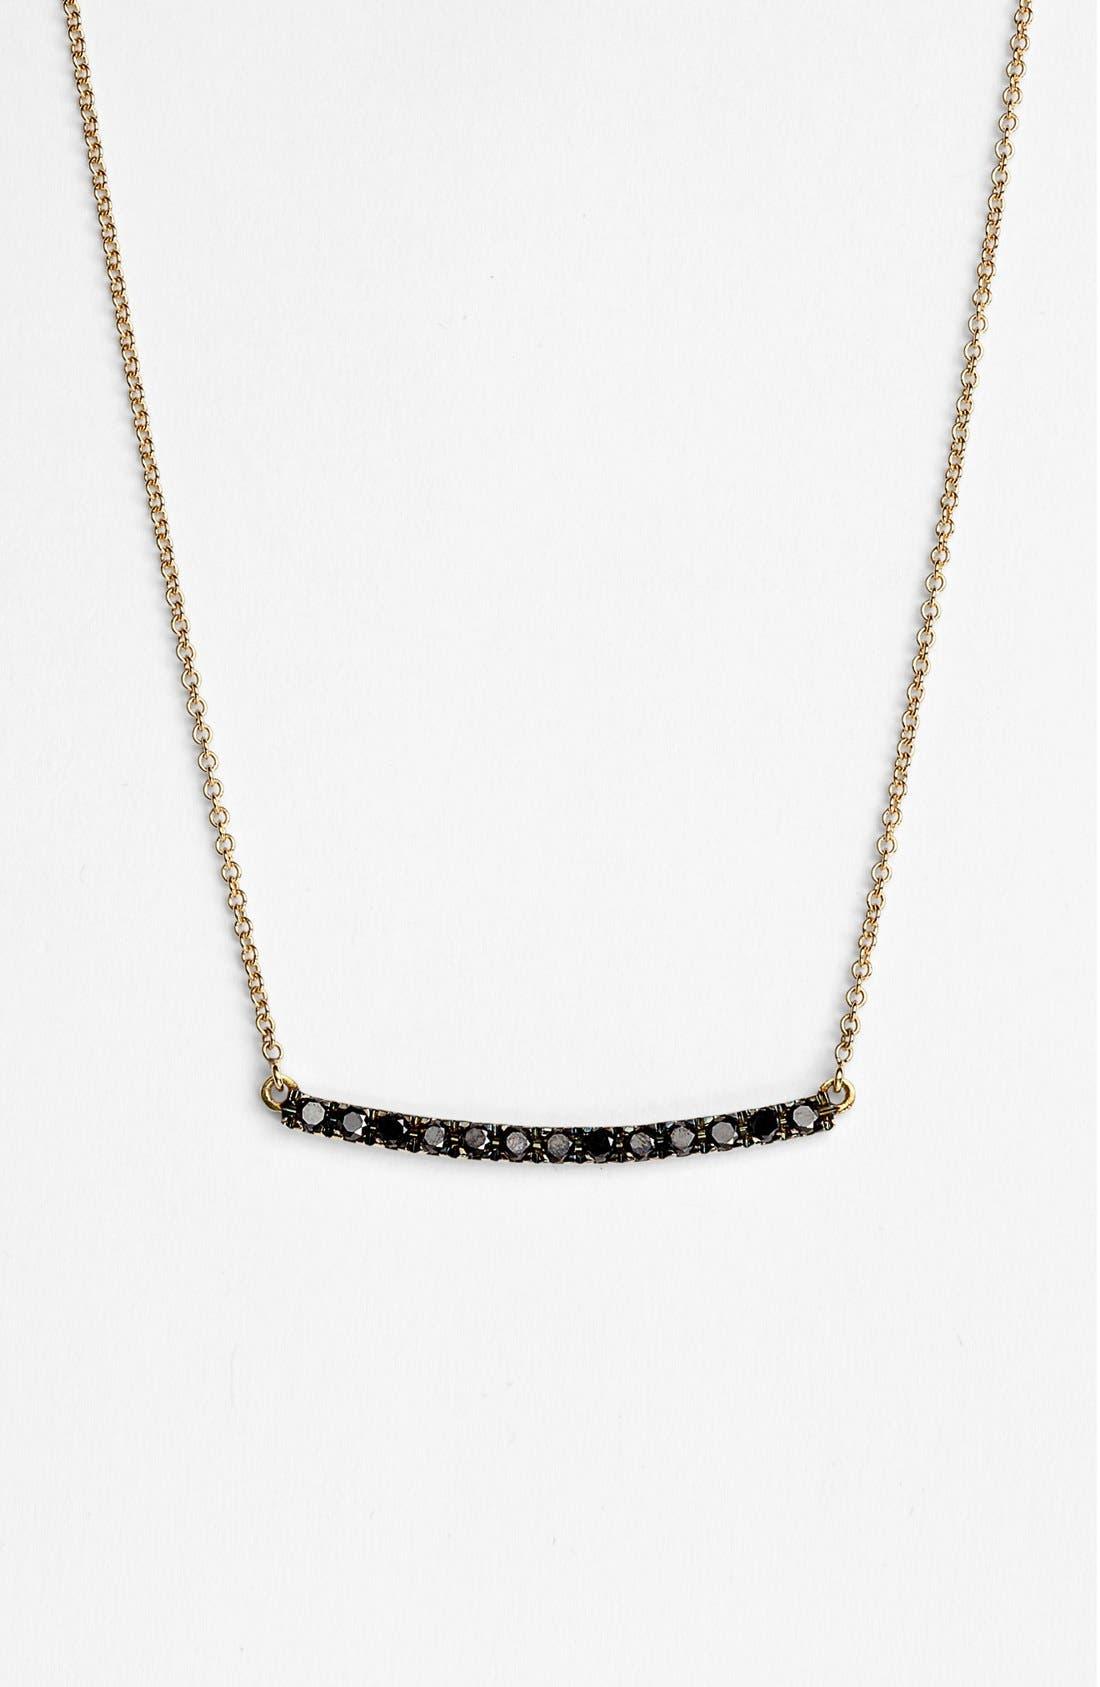 Alternate Image 1 Selected - Bony Levy 'Stick' Pavé Black Diamond Bar Necklace (Nordstrom Exclusive)